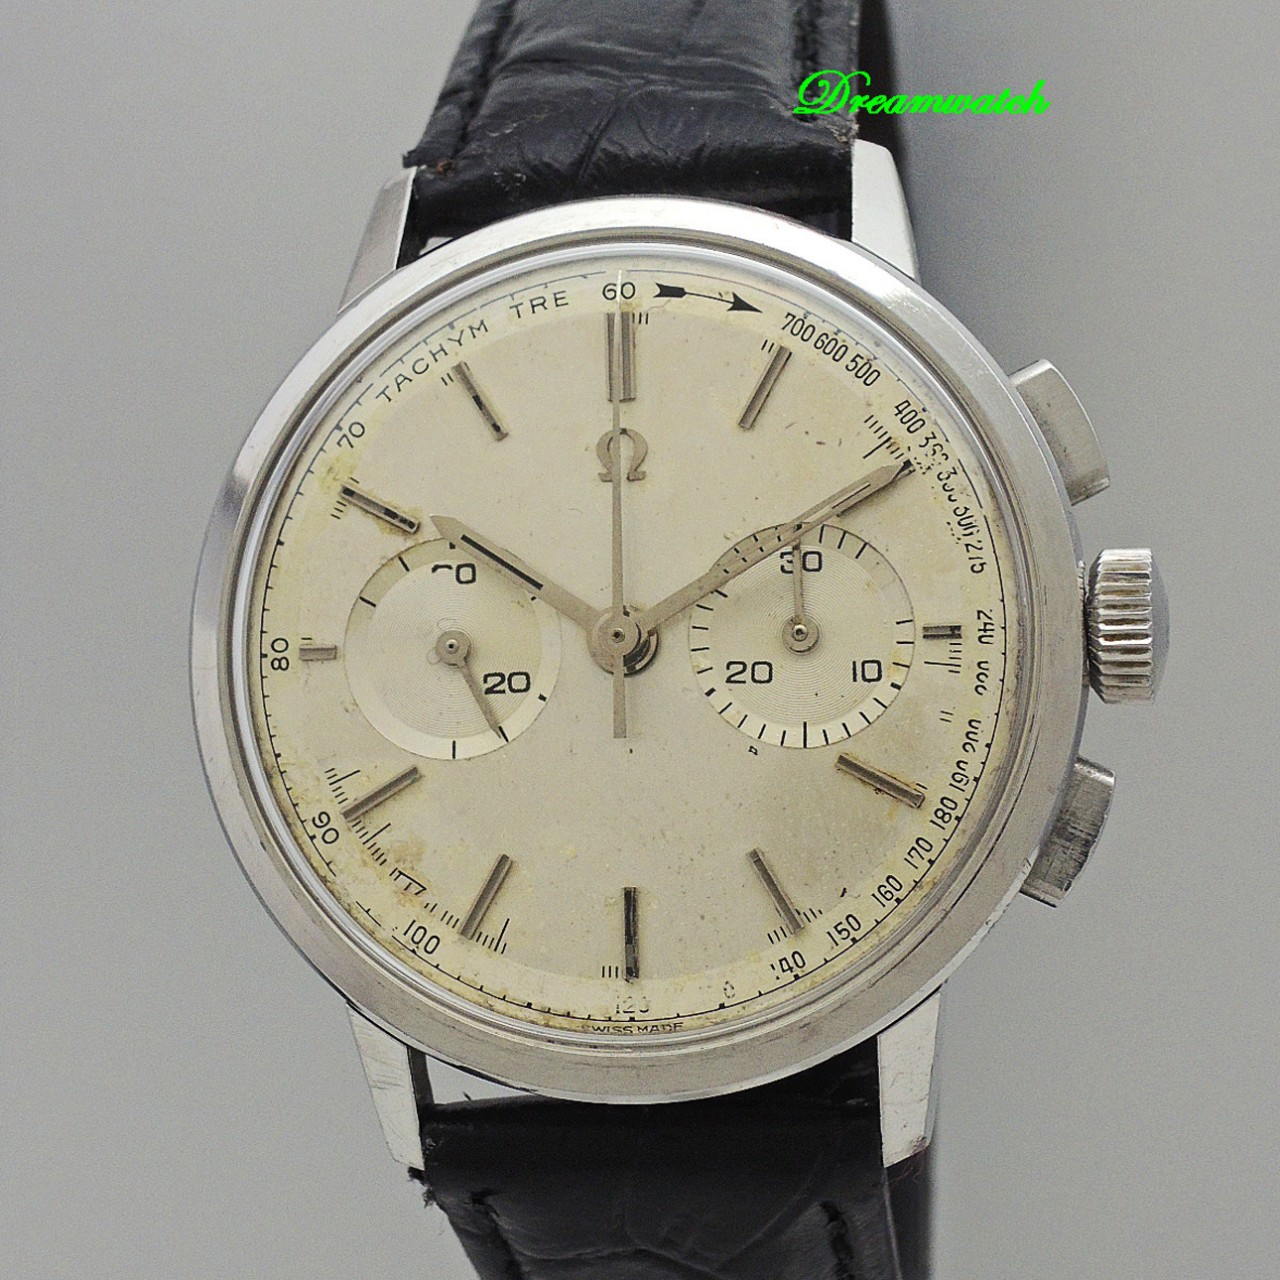 Omega Vintage Chronograph Cal.320, Jear 1964